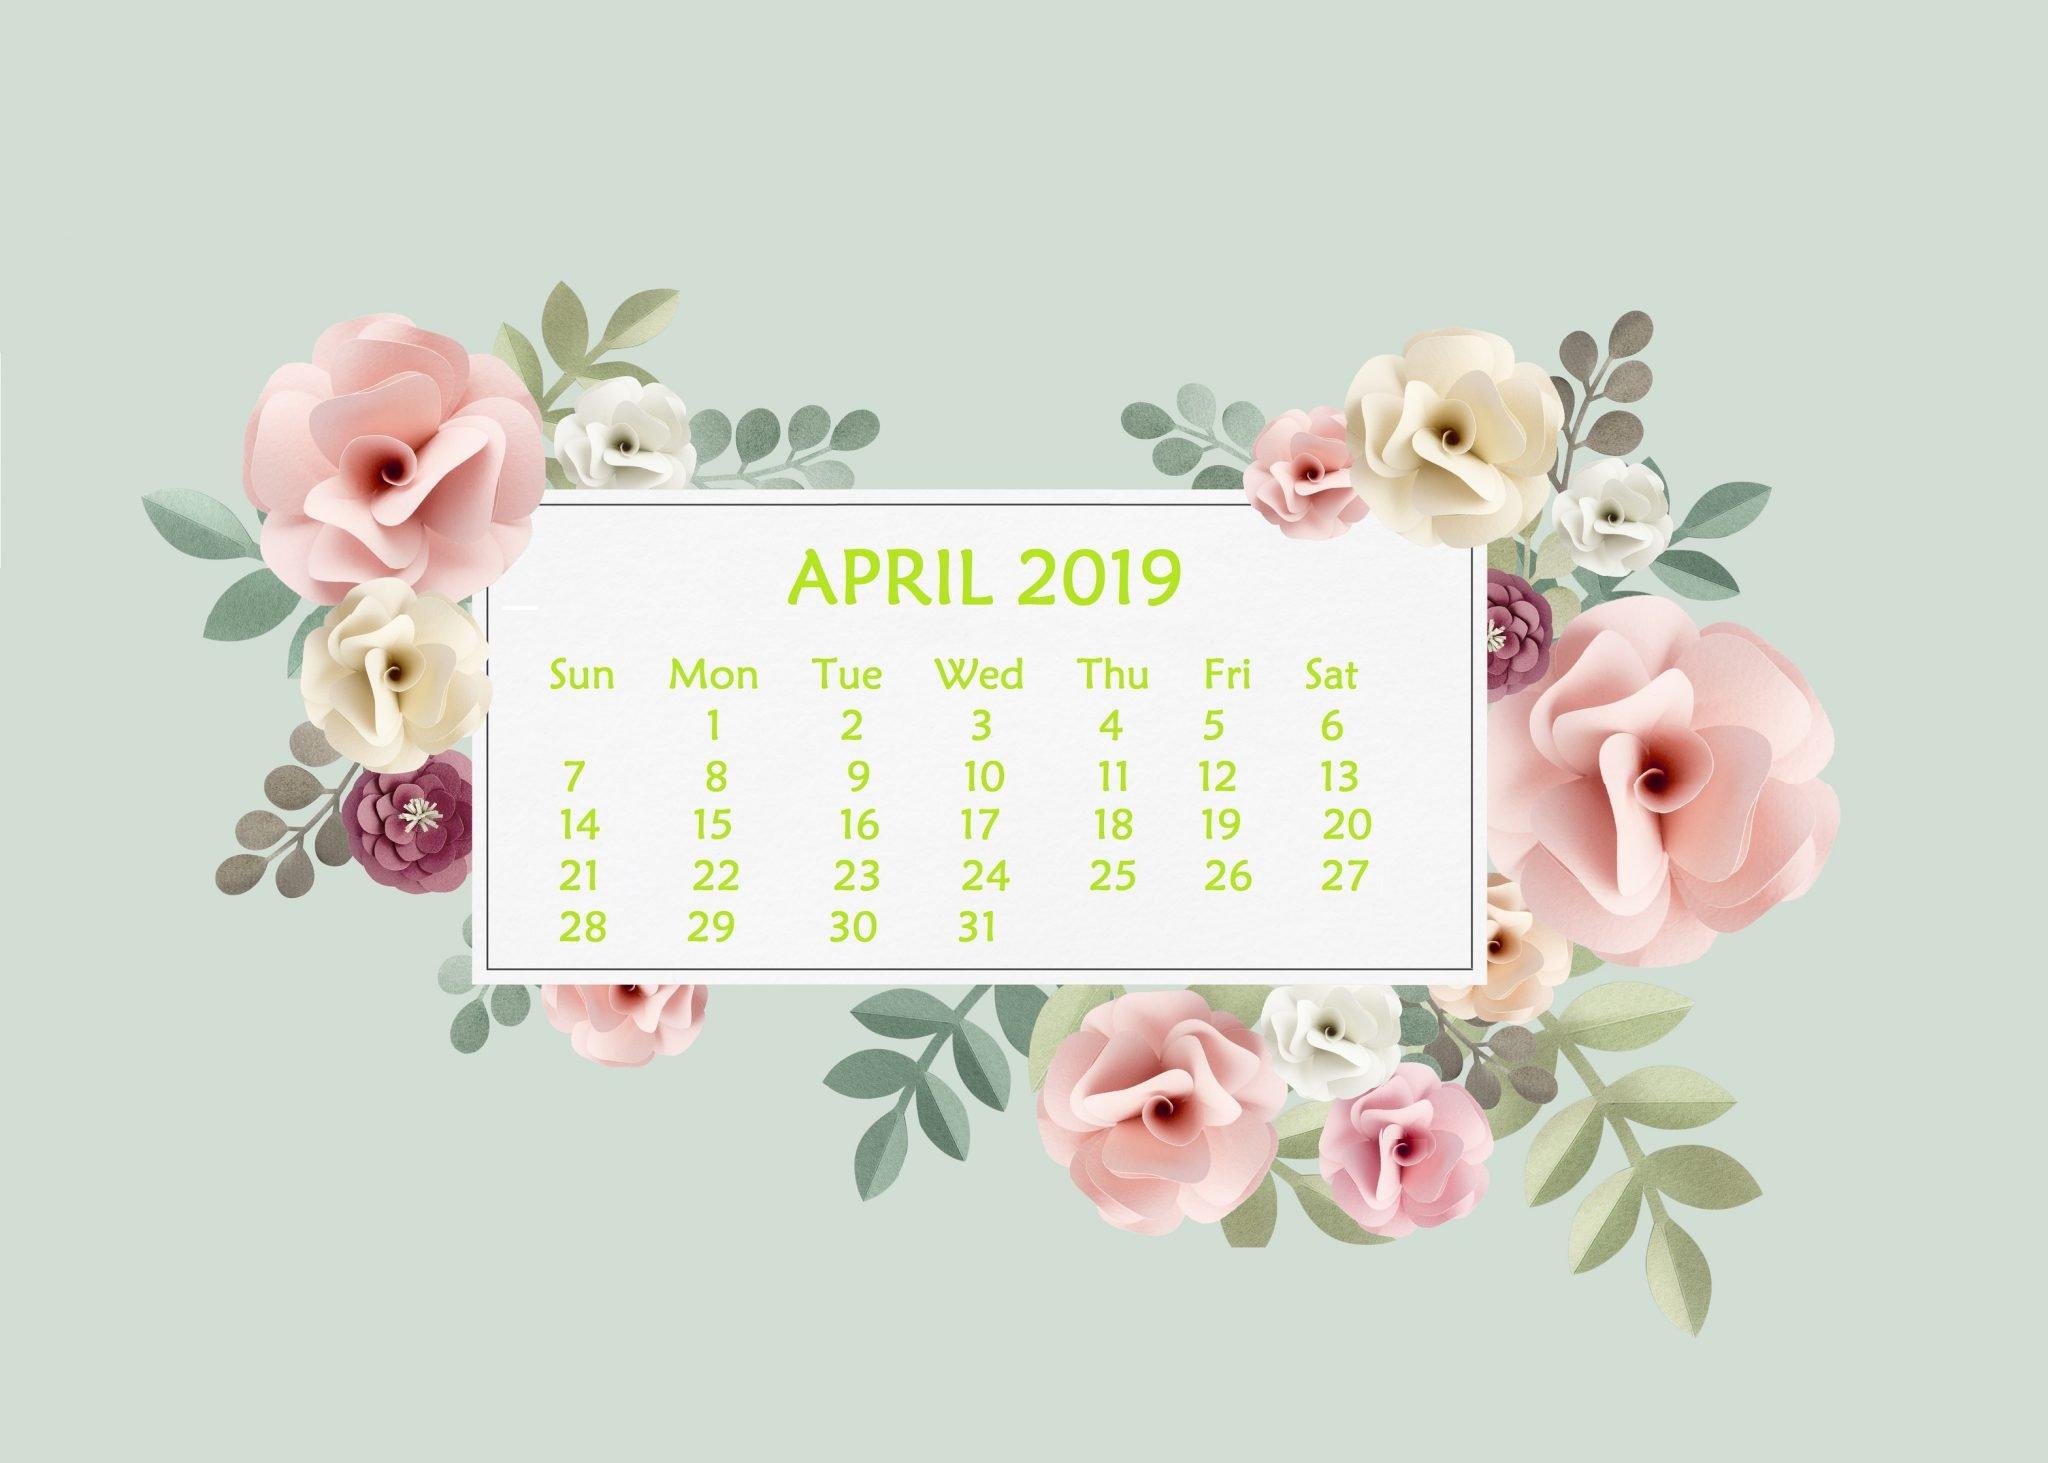 April 2019 Desktop Wallpaper With Calendar – April 2019 Calendar Calendar 2019 On Computer